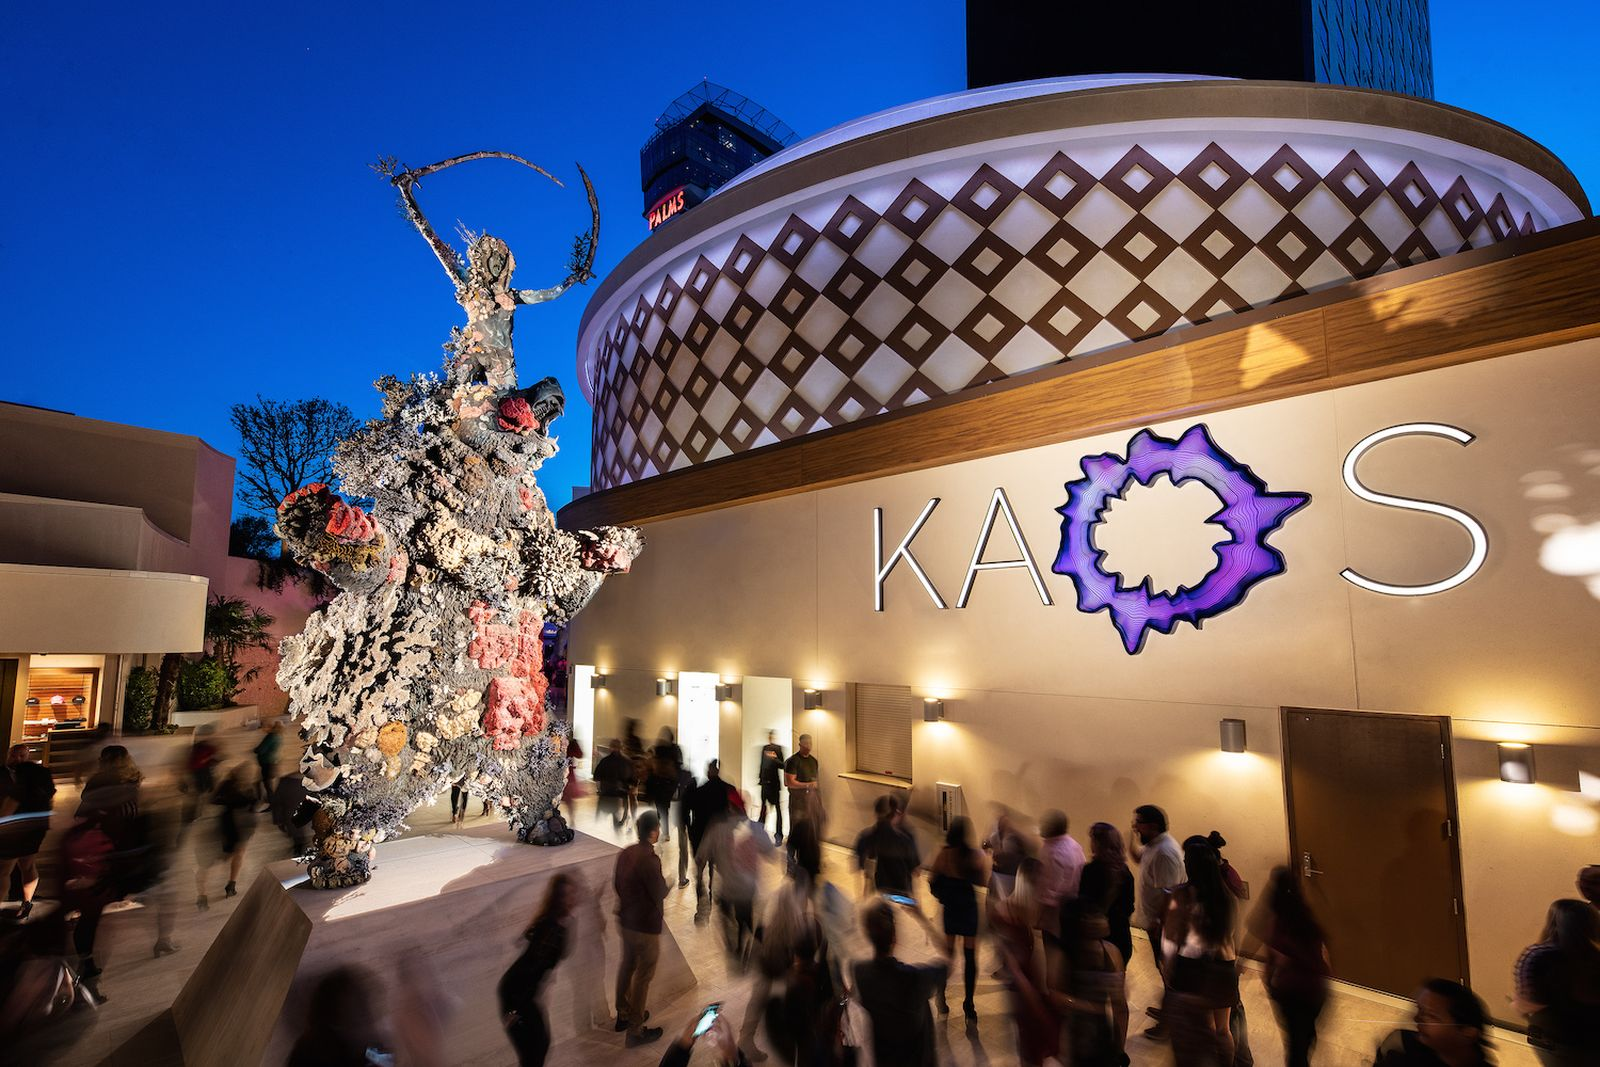 damien hirst demon with bowl statue kaos Palms Casino Resort